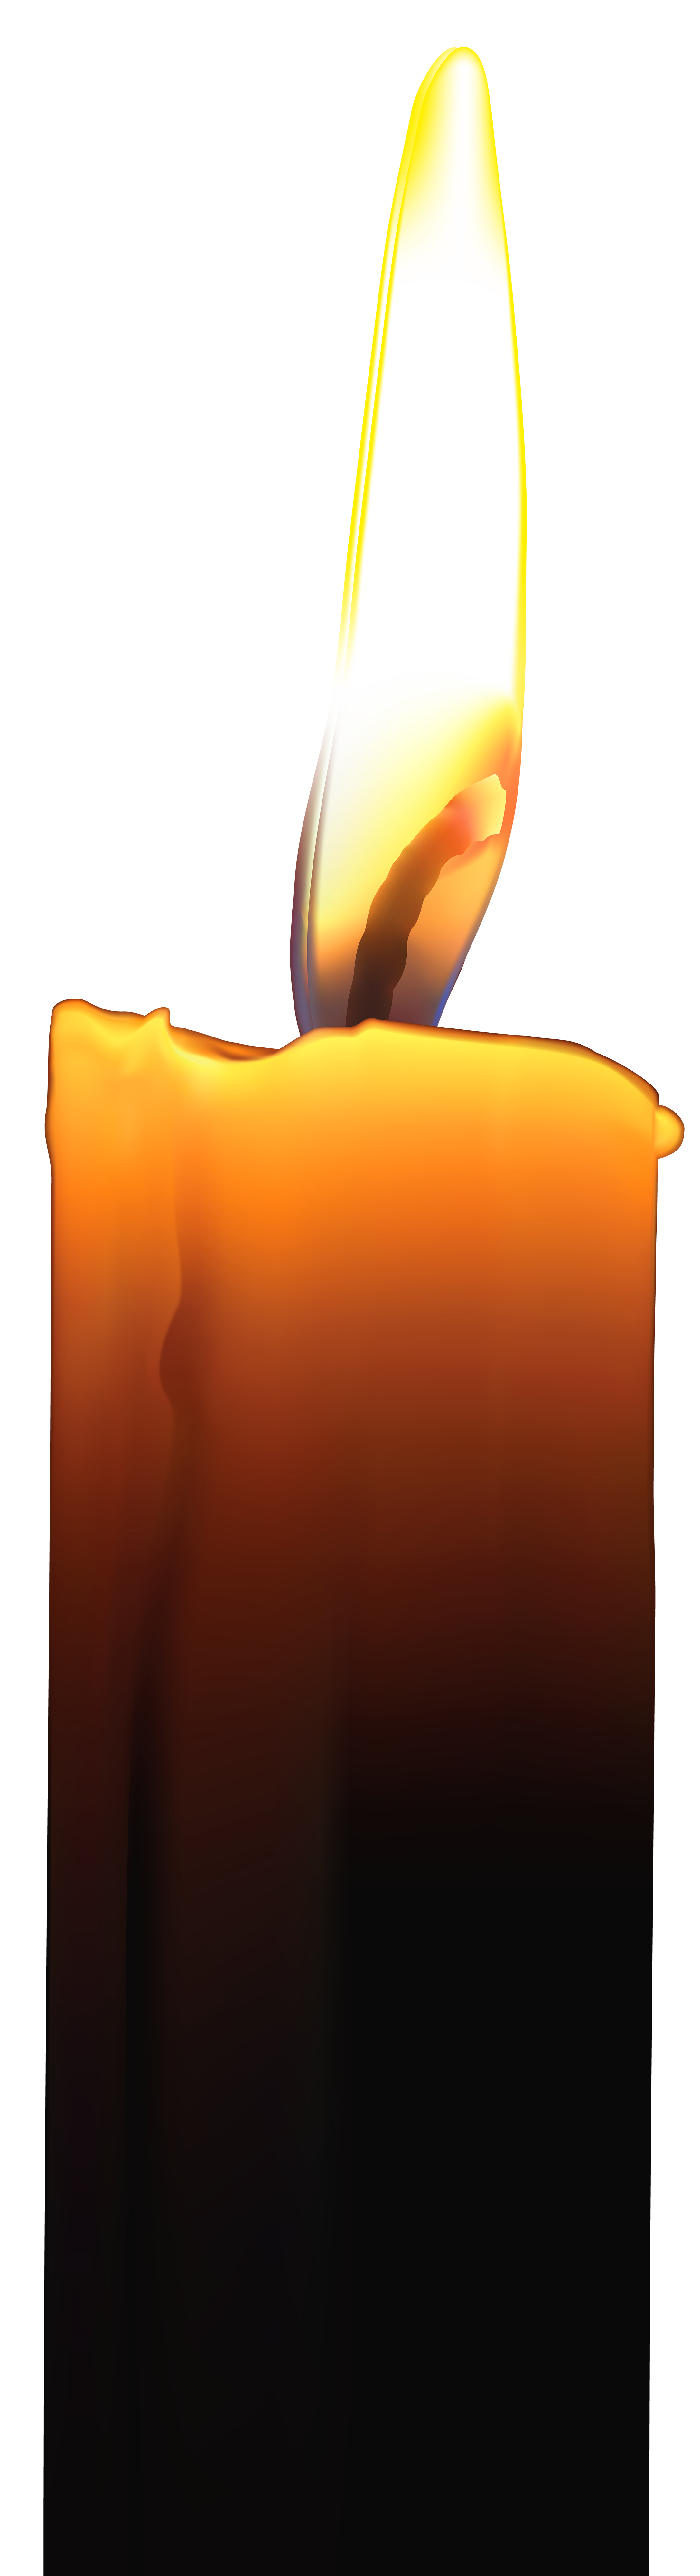 Memorial Candle PNG Clip Art Image.